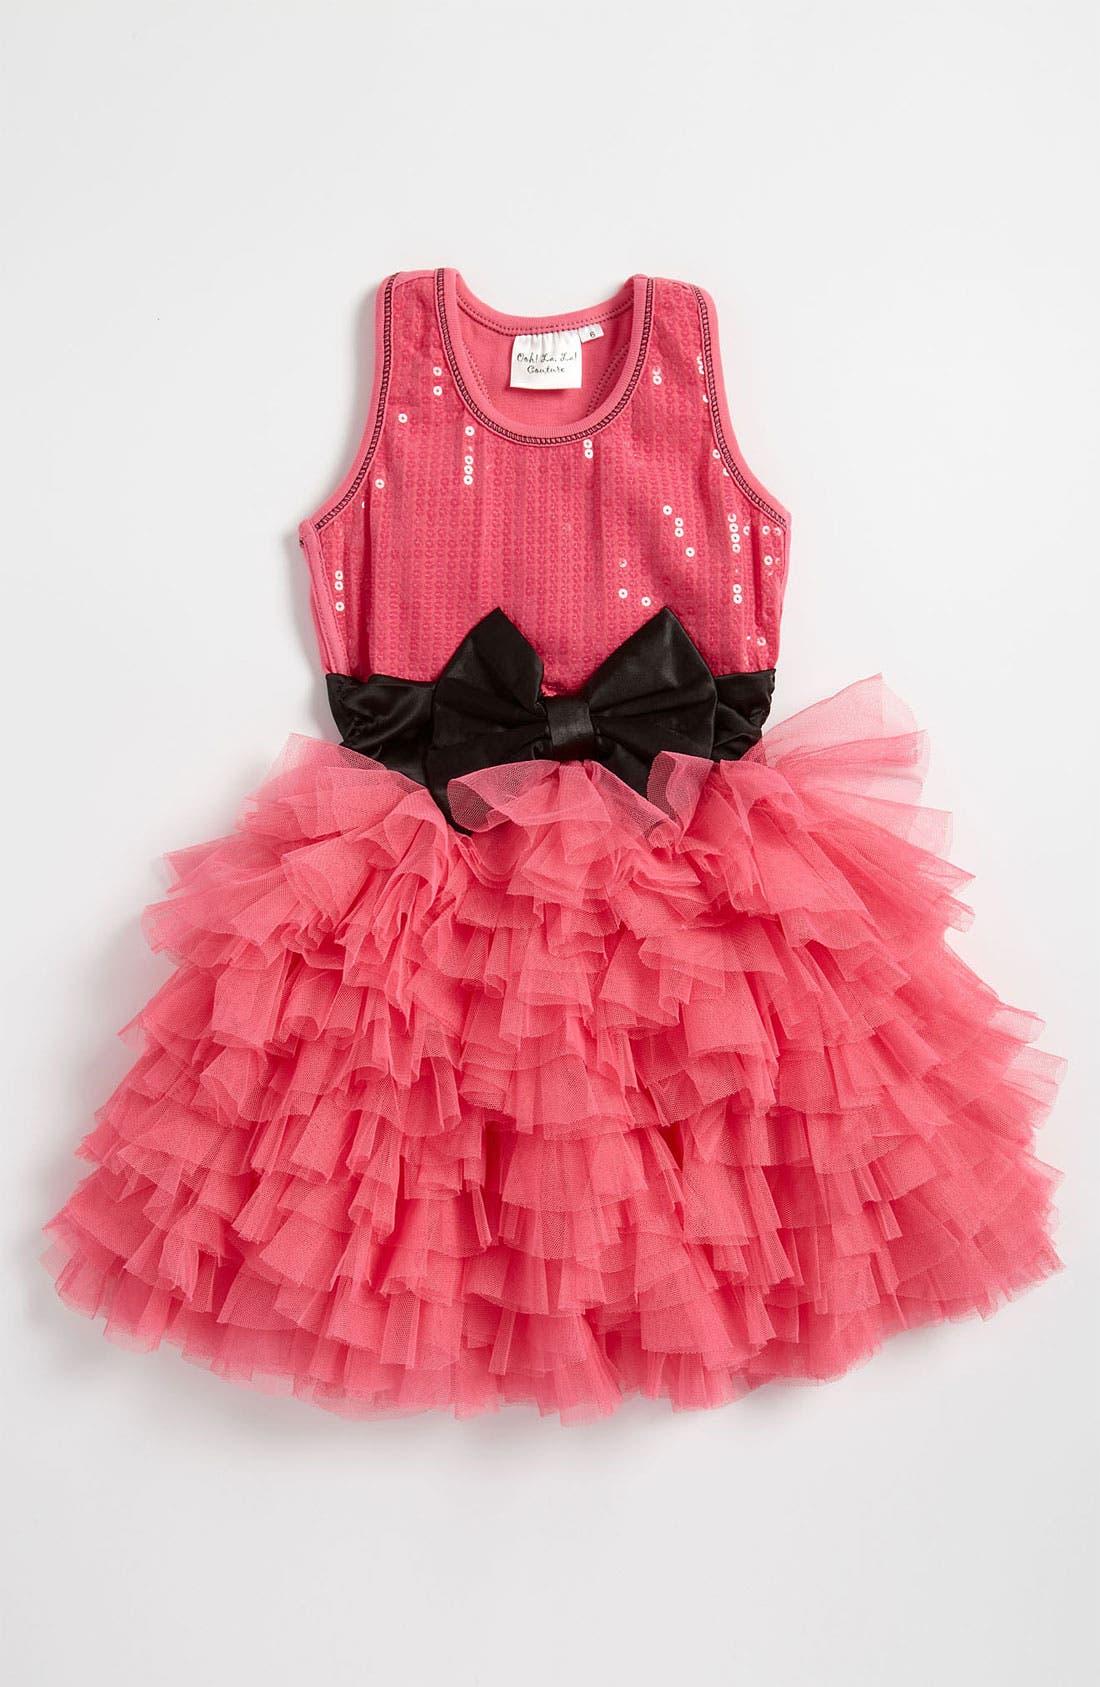 Alternate Image 1 Selected - Ooh! La, La! Couture 'Wow' Sequin Tutu Dress (Little Girls)